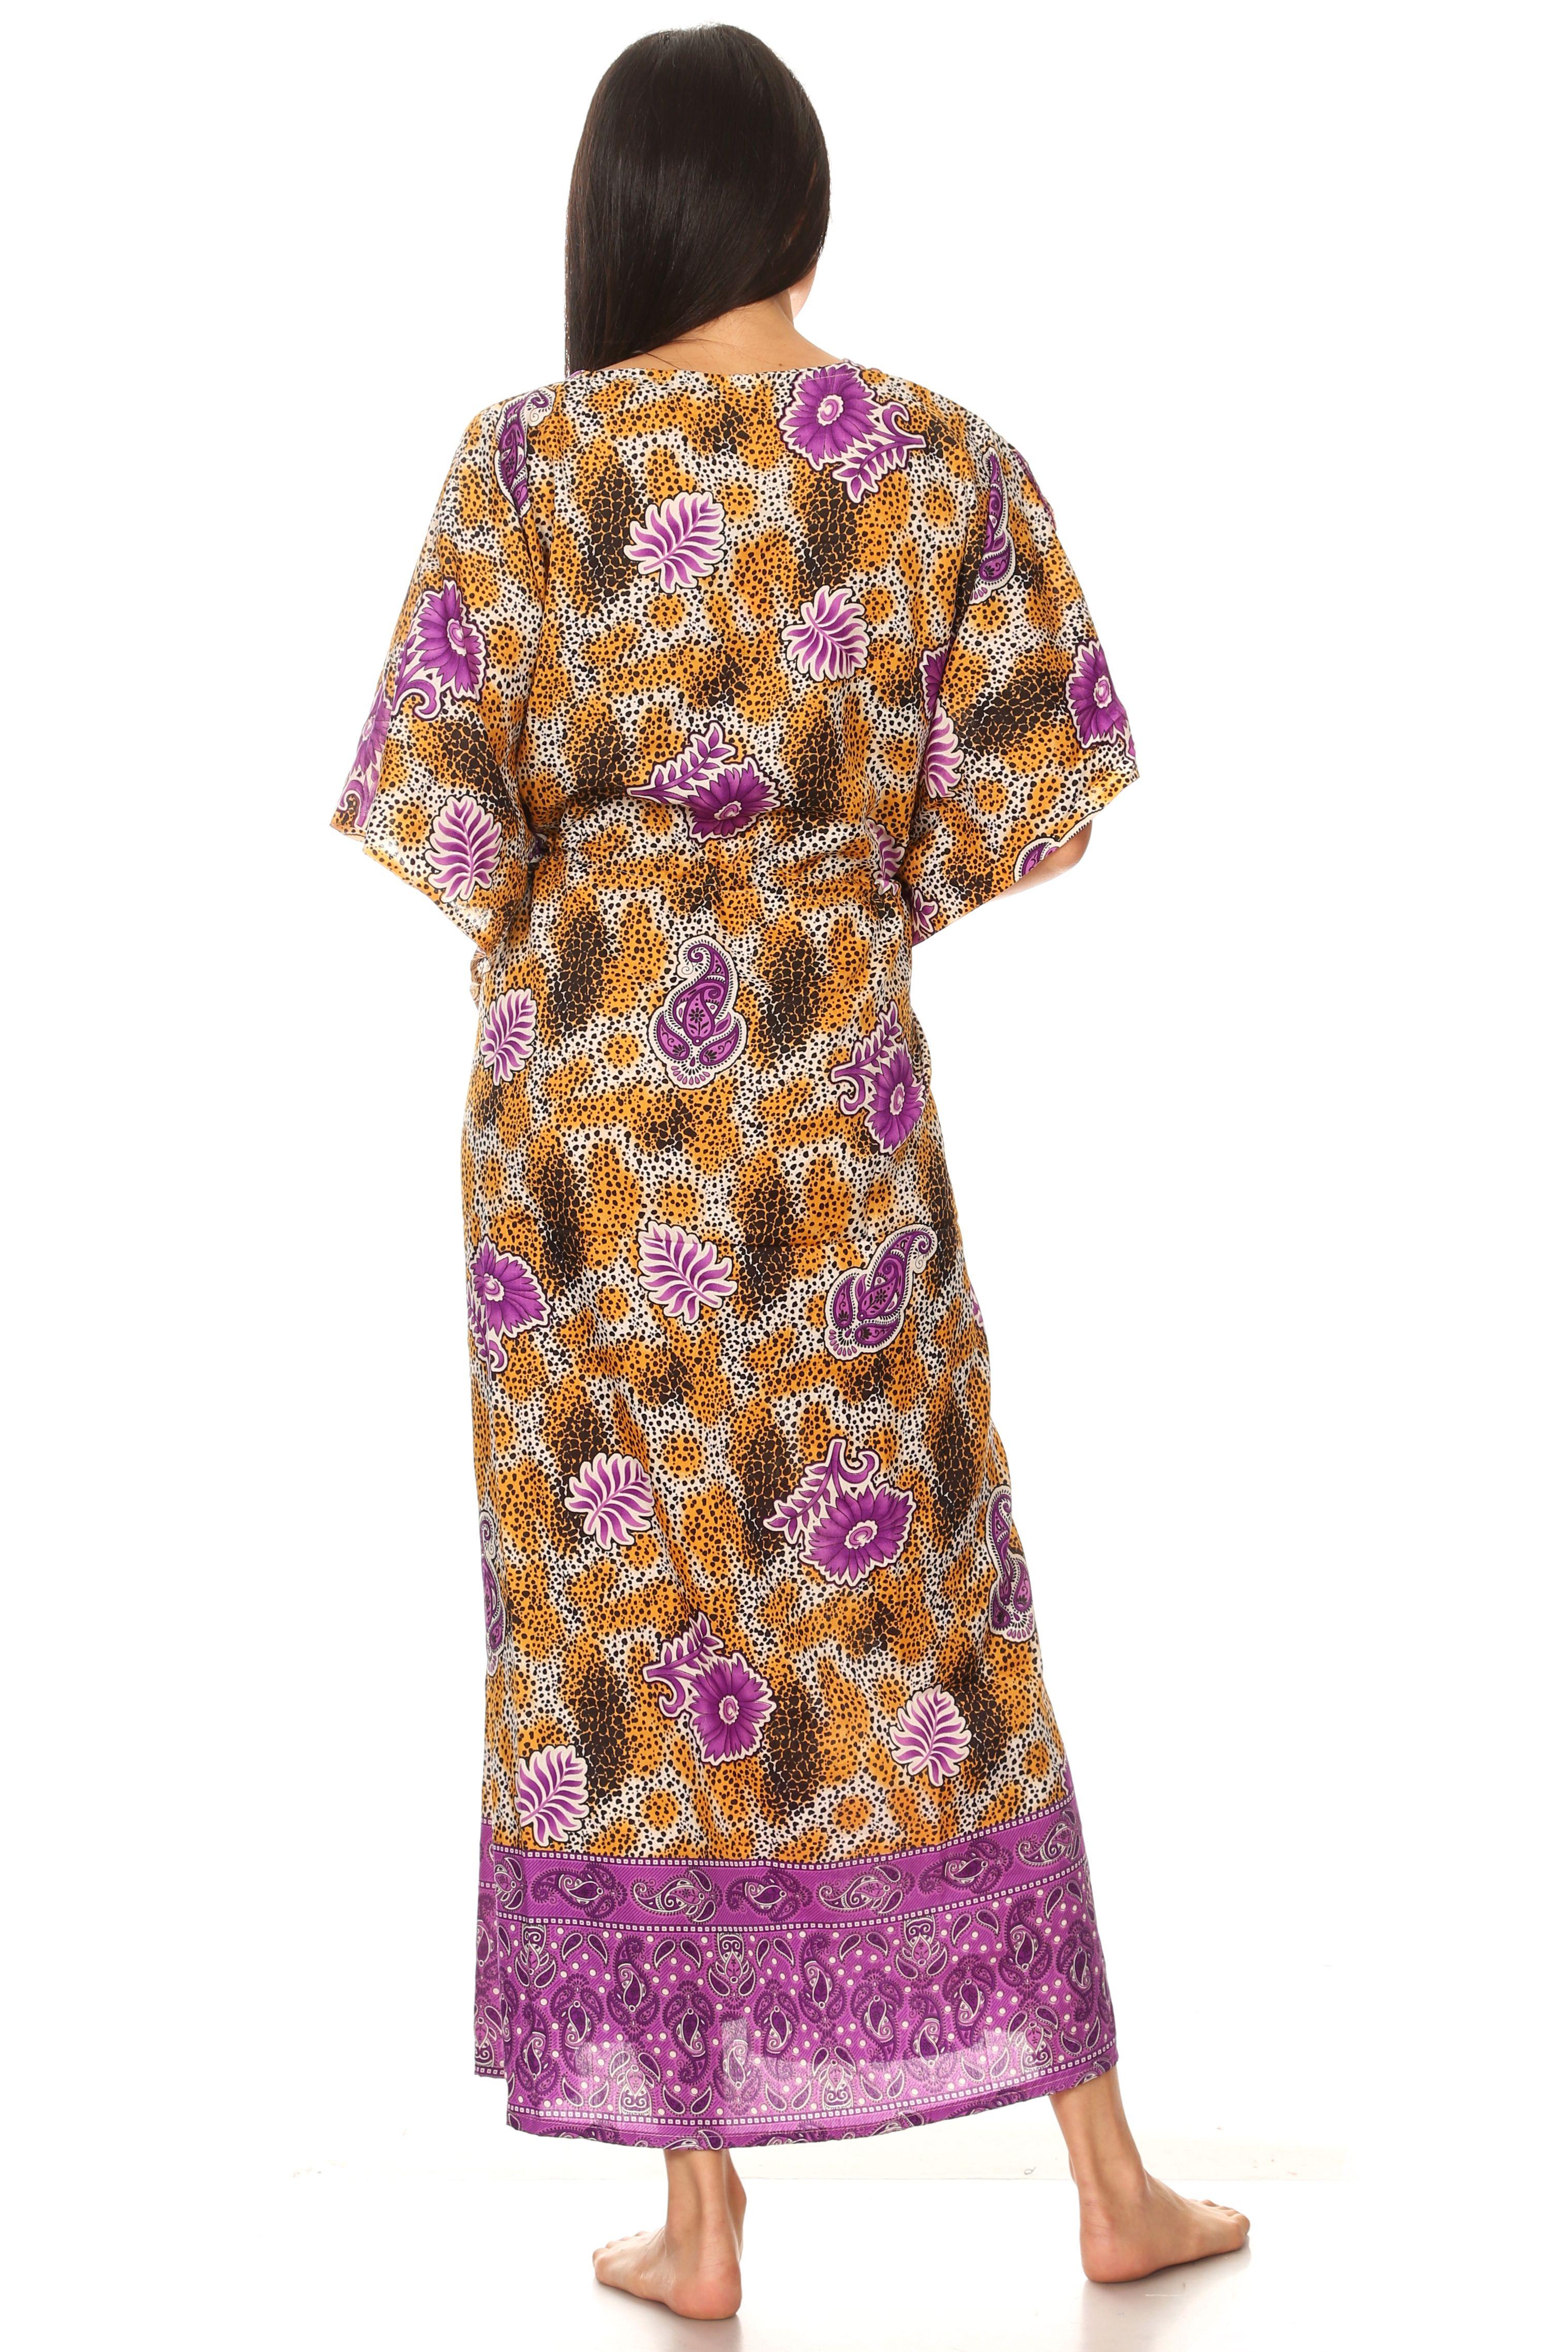 Premiere Fashion Caftan Dresses For Women V Neck Long Kaftan Cover Up Summer Maxi Dress Walmart Com Summer Maxi Dress Maxi Dresses Summer Casual Maxi Dress Summer Beach [ 4548 x 3032 Pixel ]